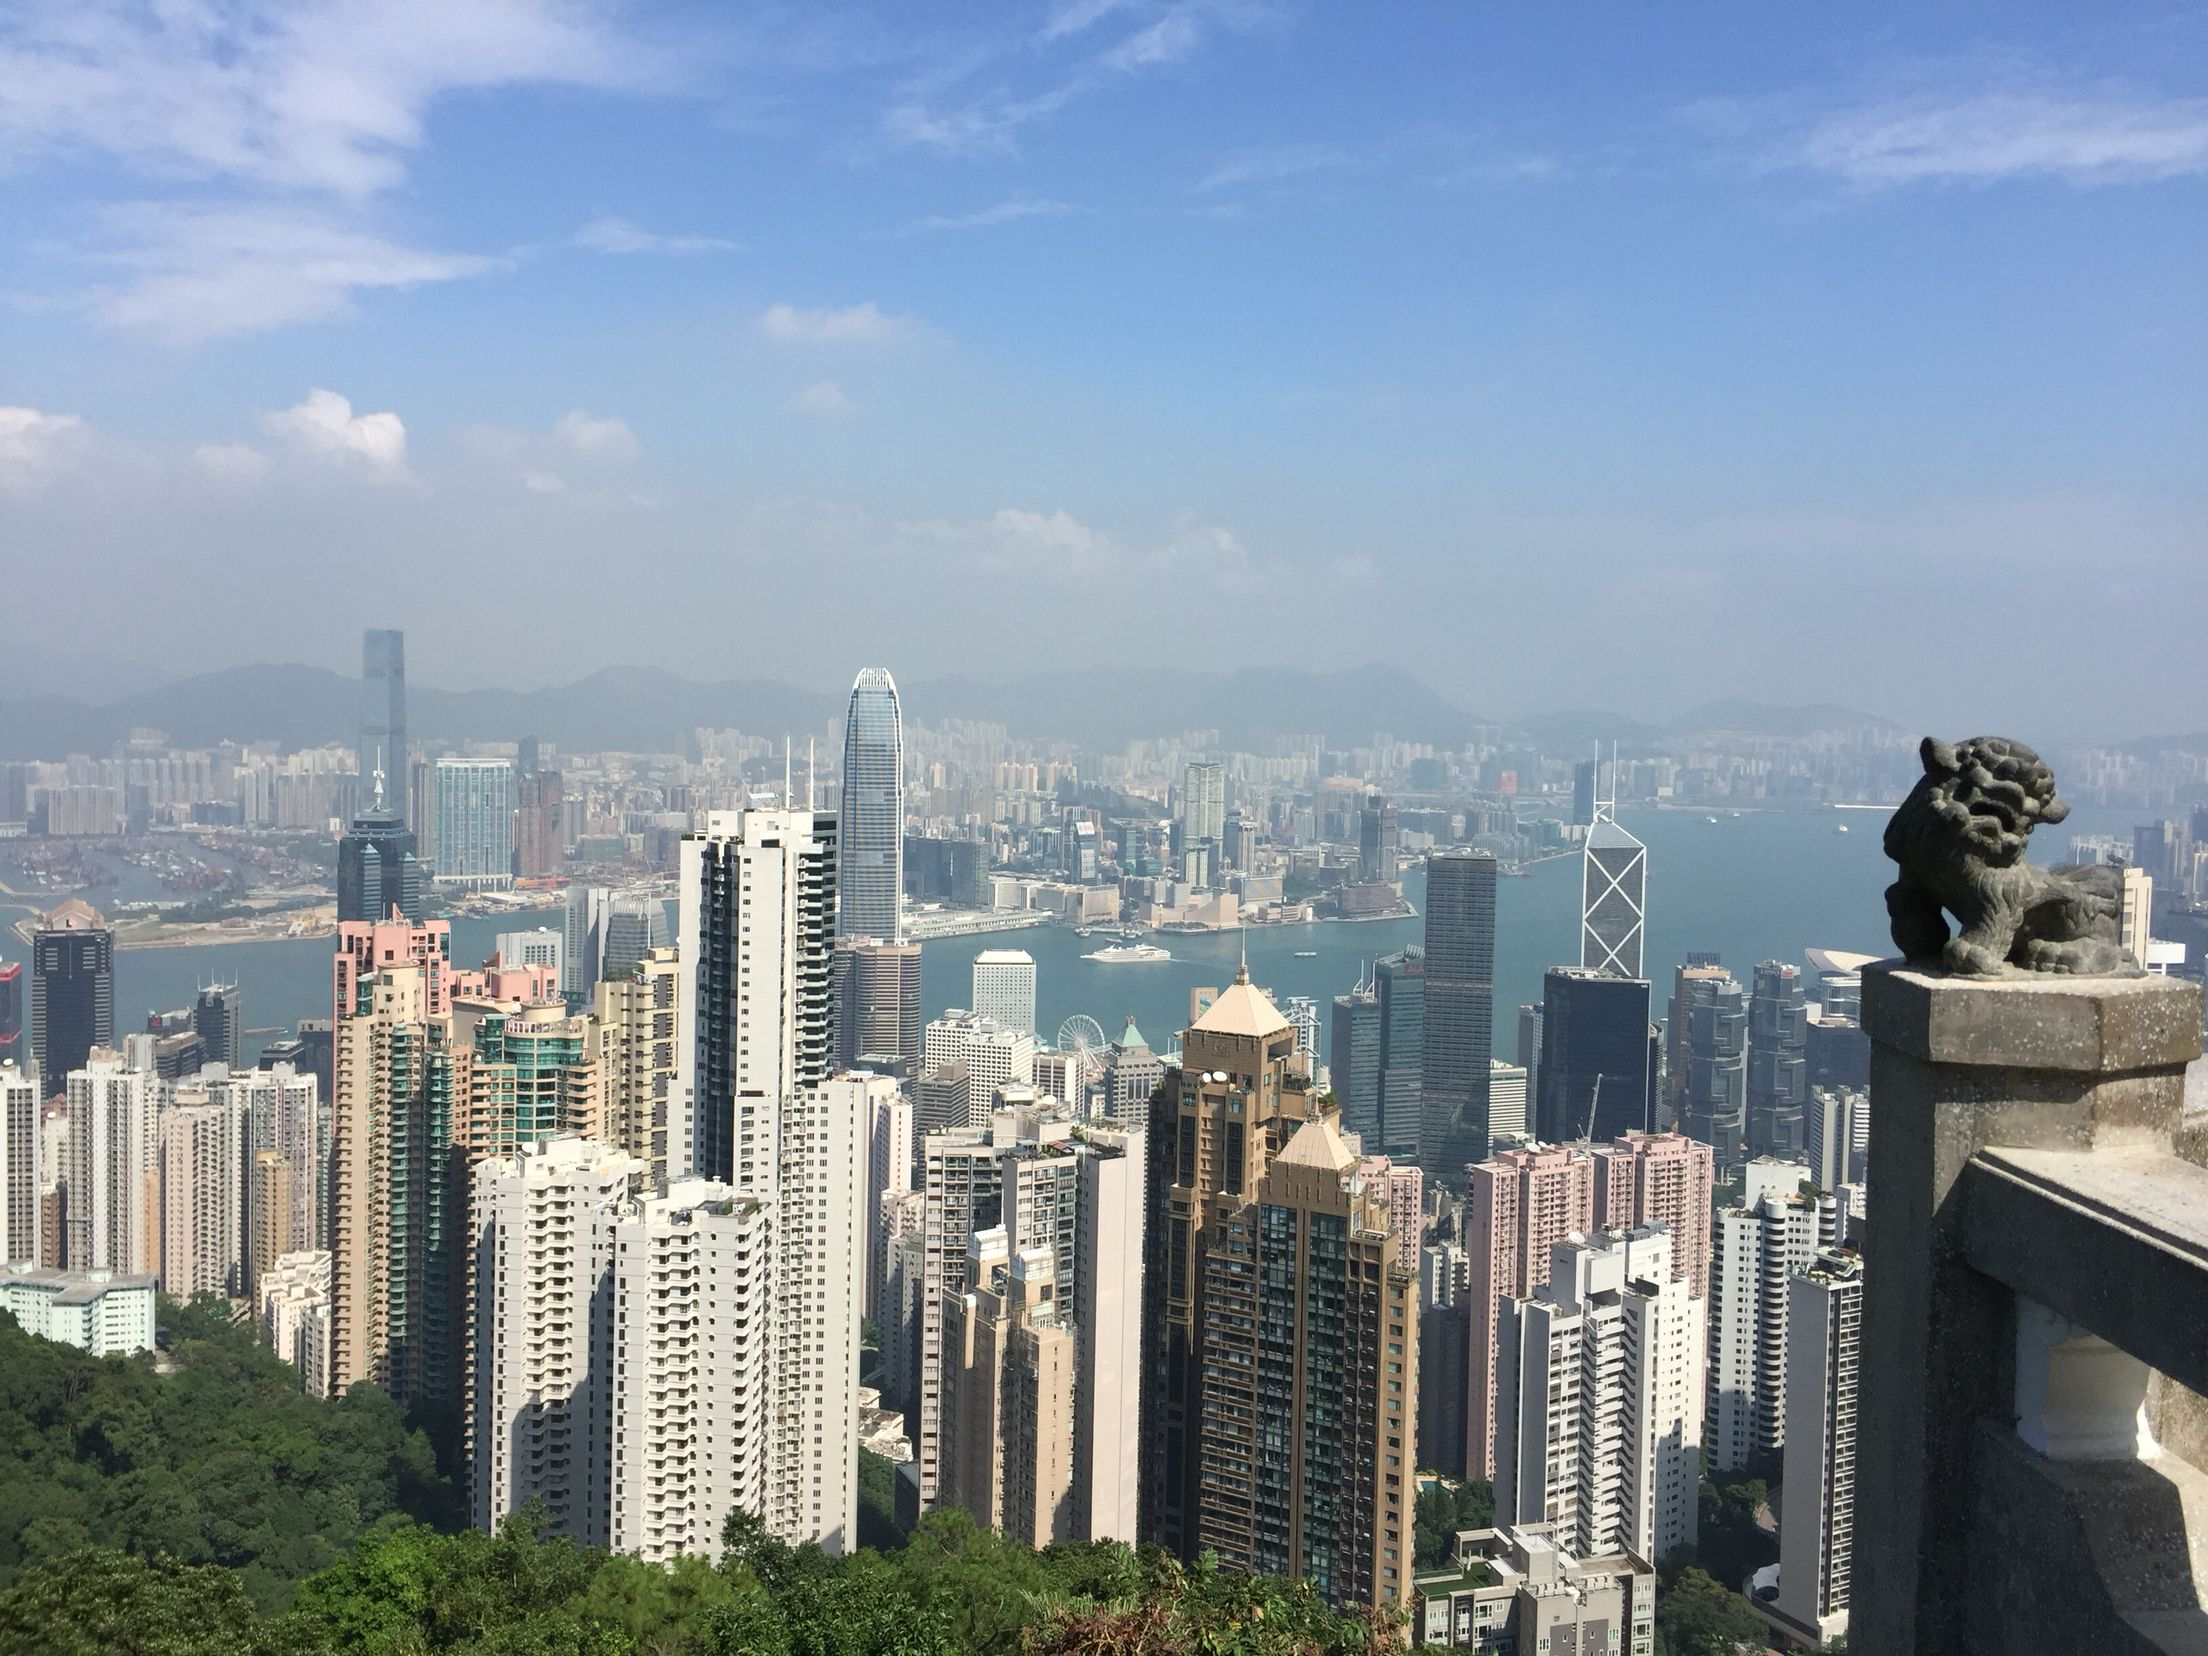 Hong kong skyline orte einzigartige hochzeitsideen